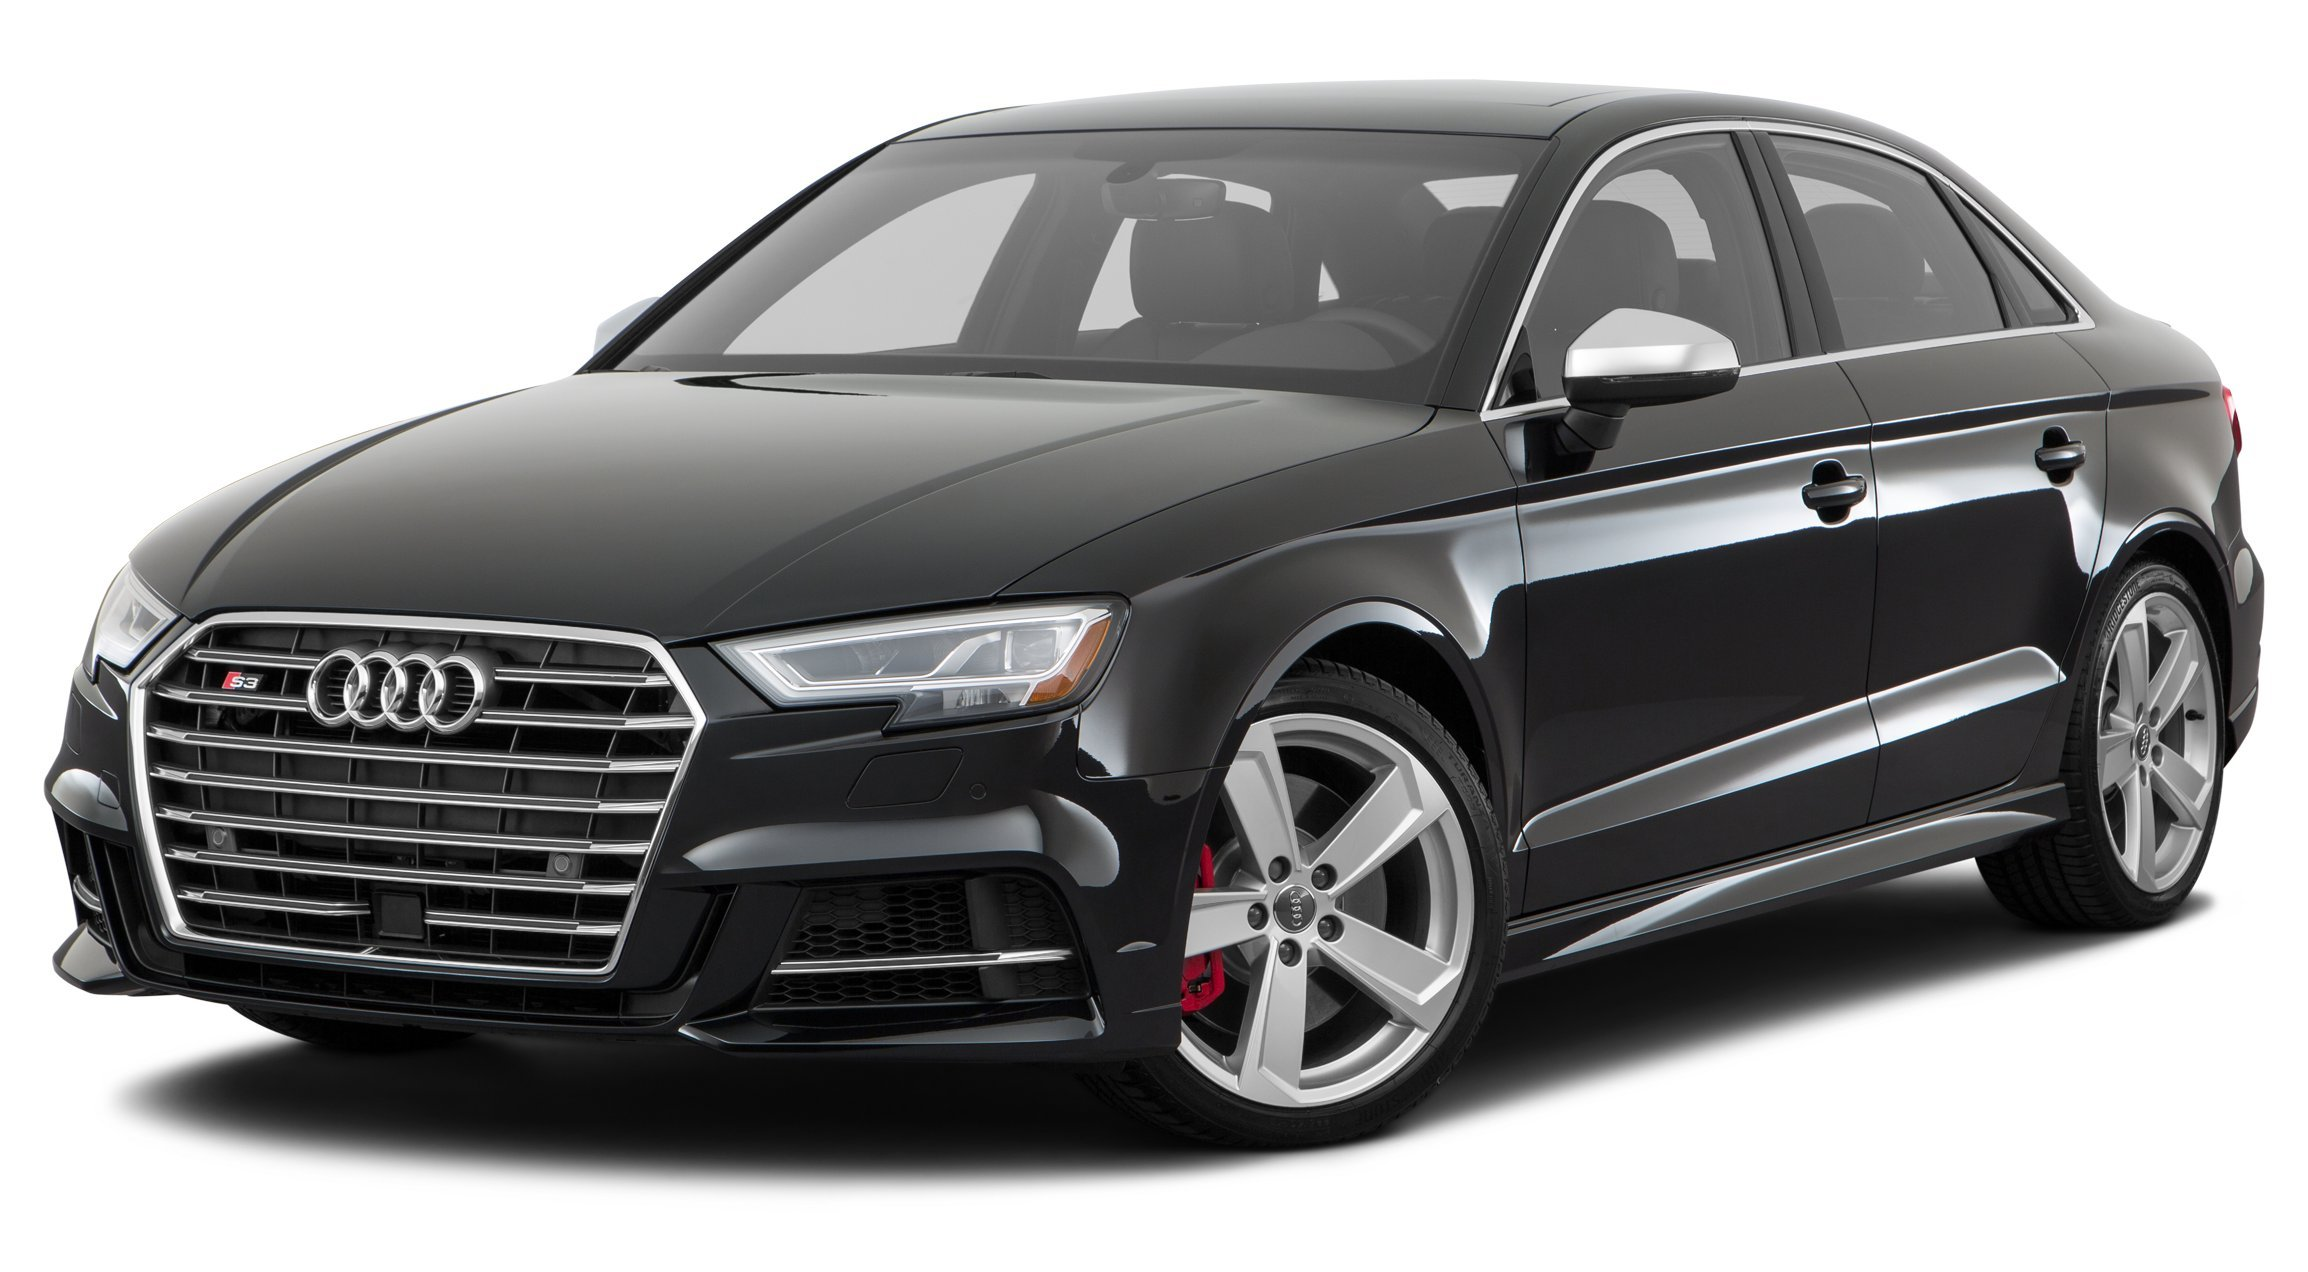 Amazoncom 2017 Audi S3 Reviews Images And Specs Vehicles